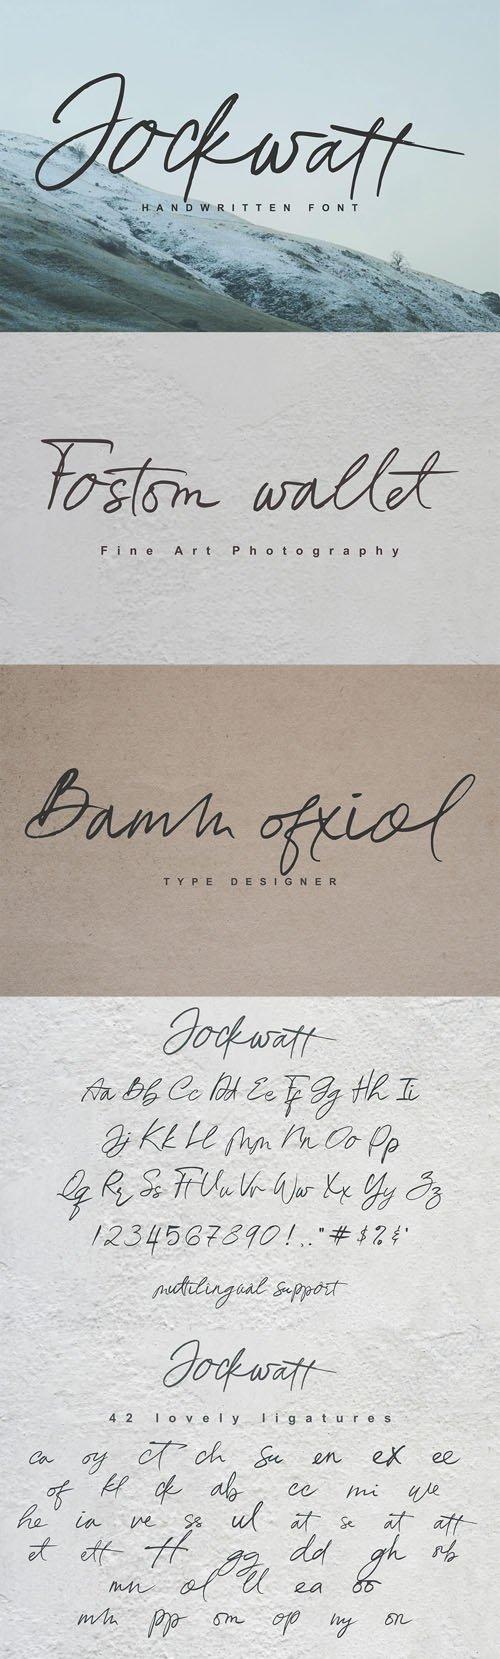 Jockwatt Handwritten Font